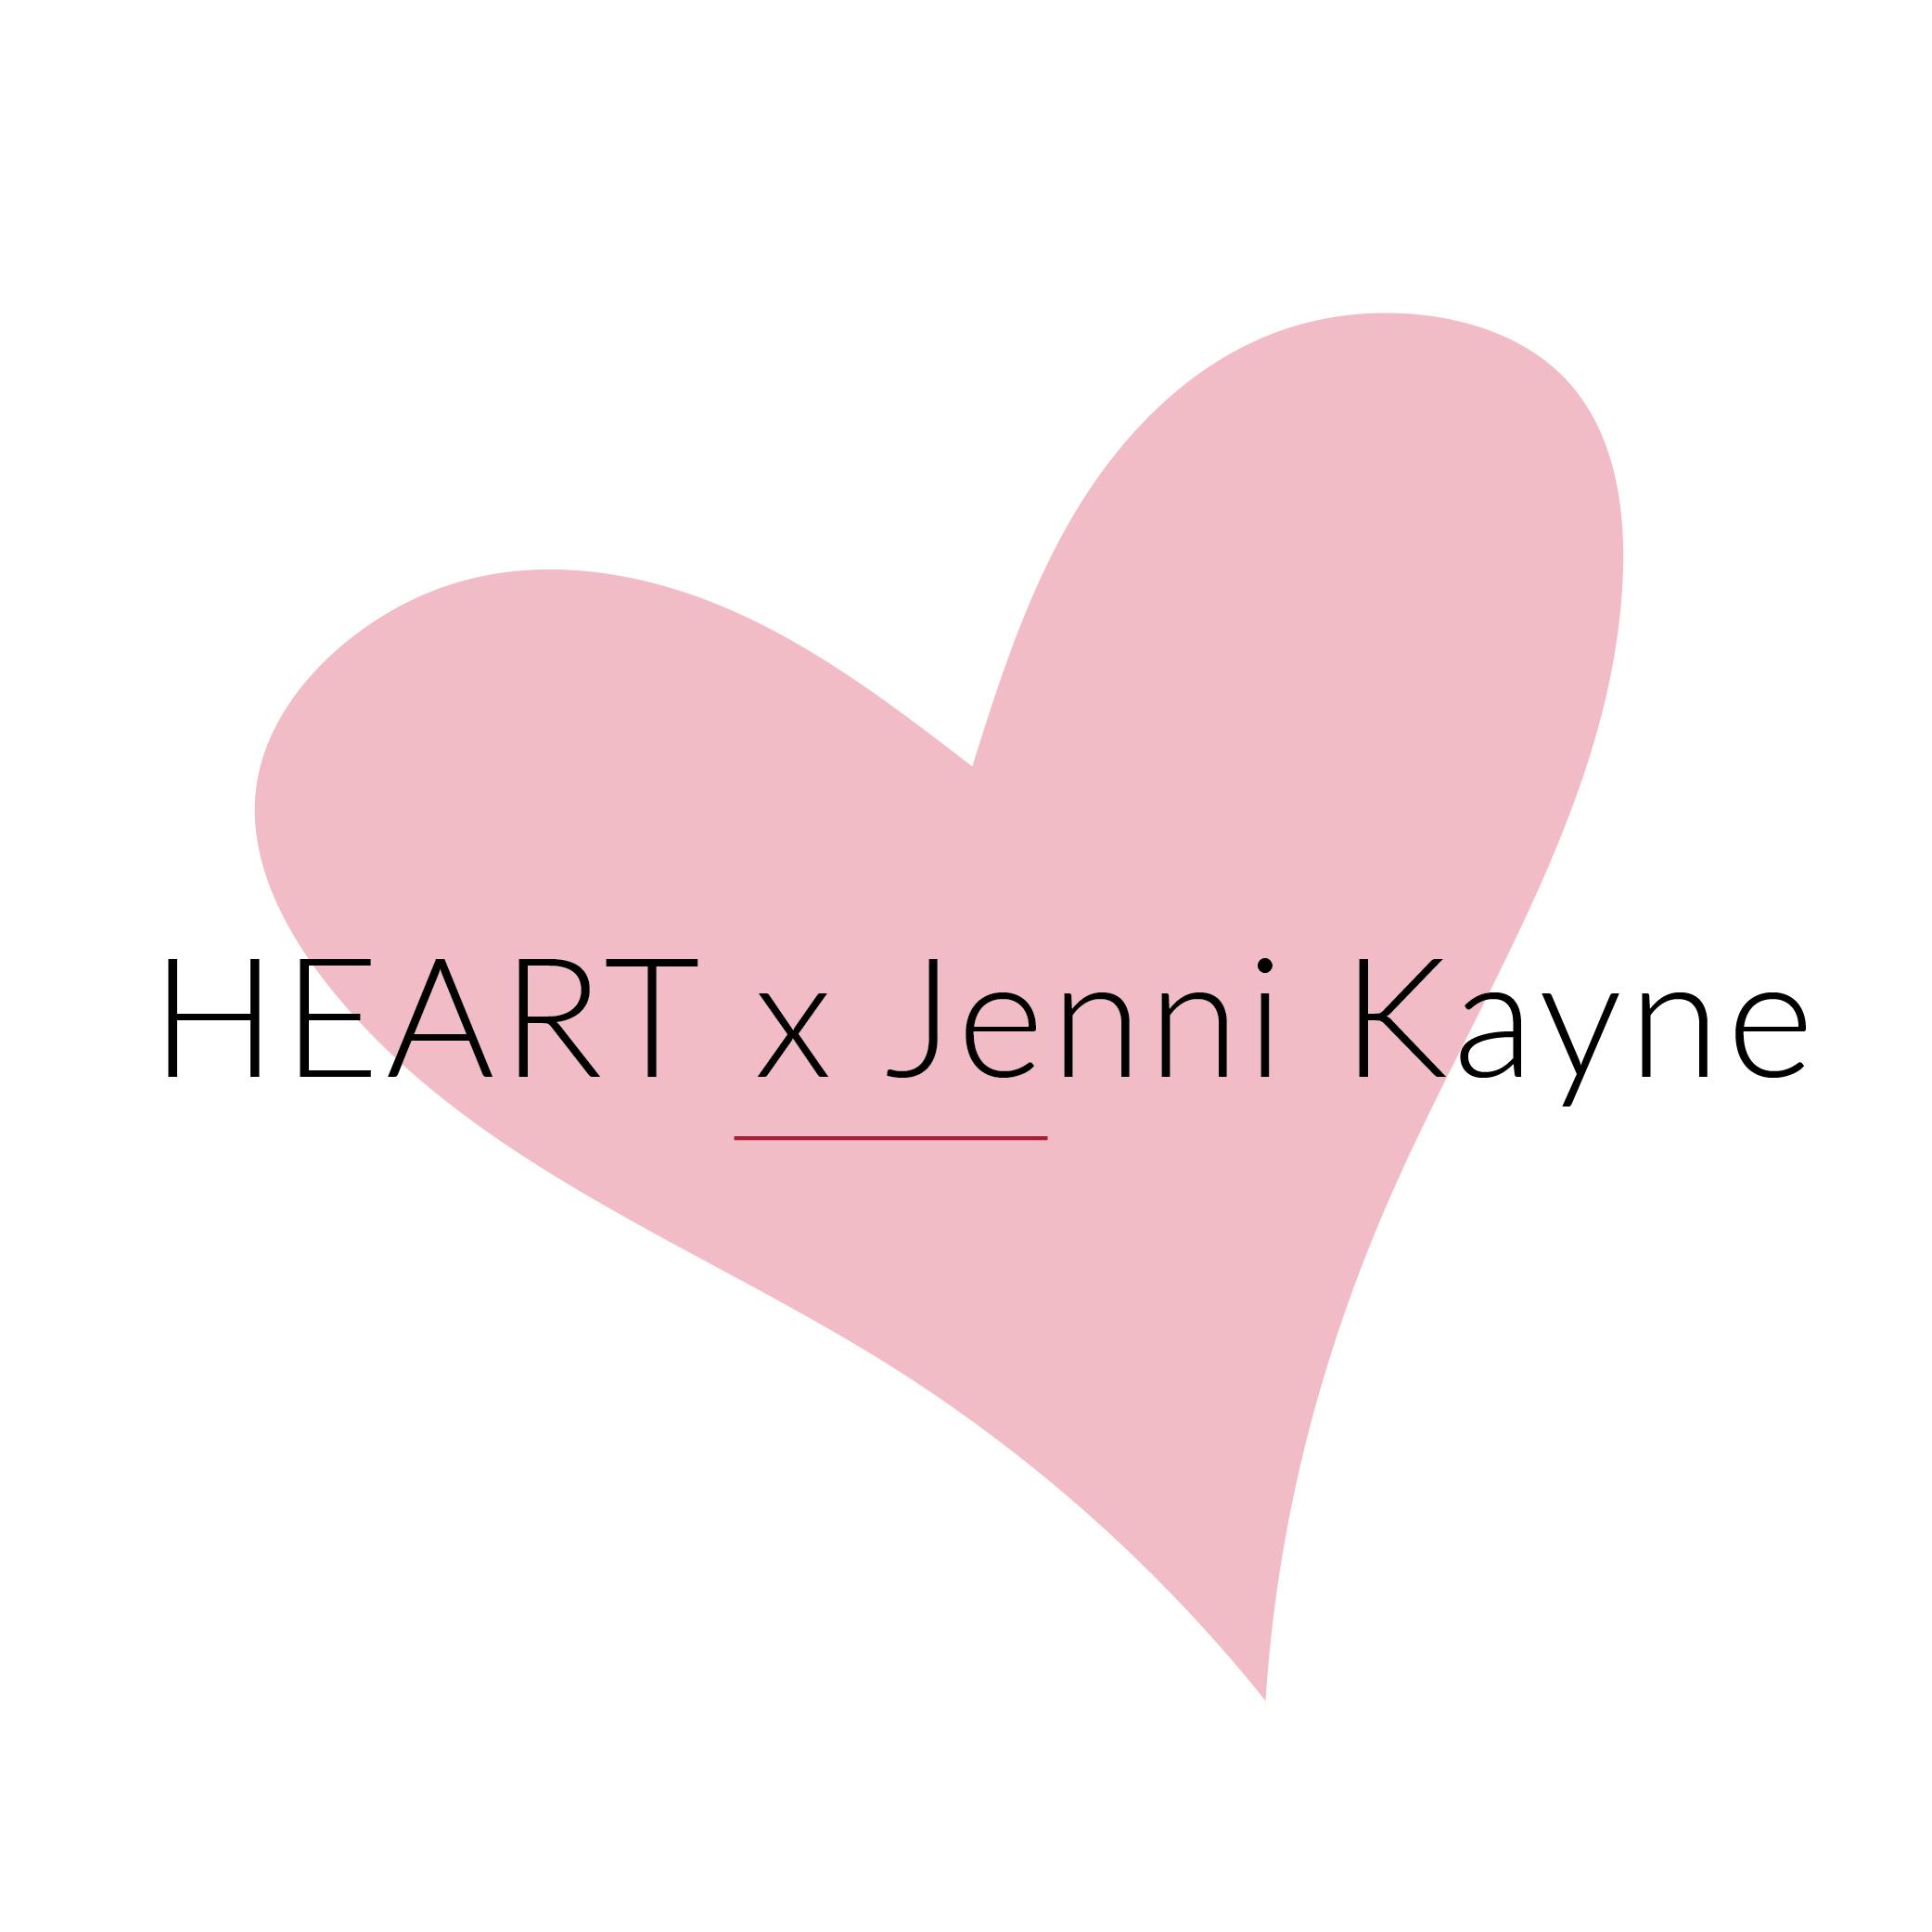 Jenni Kayne Valentines 2017